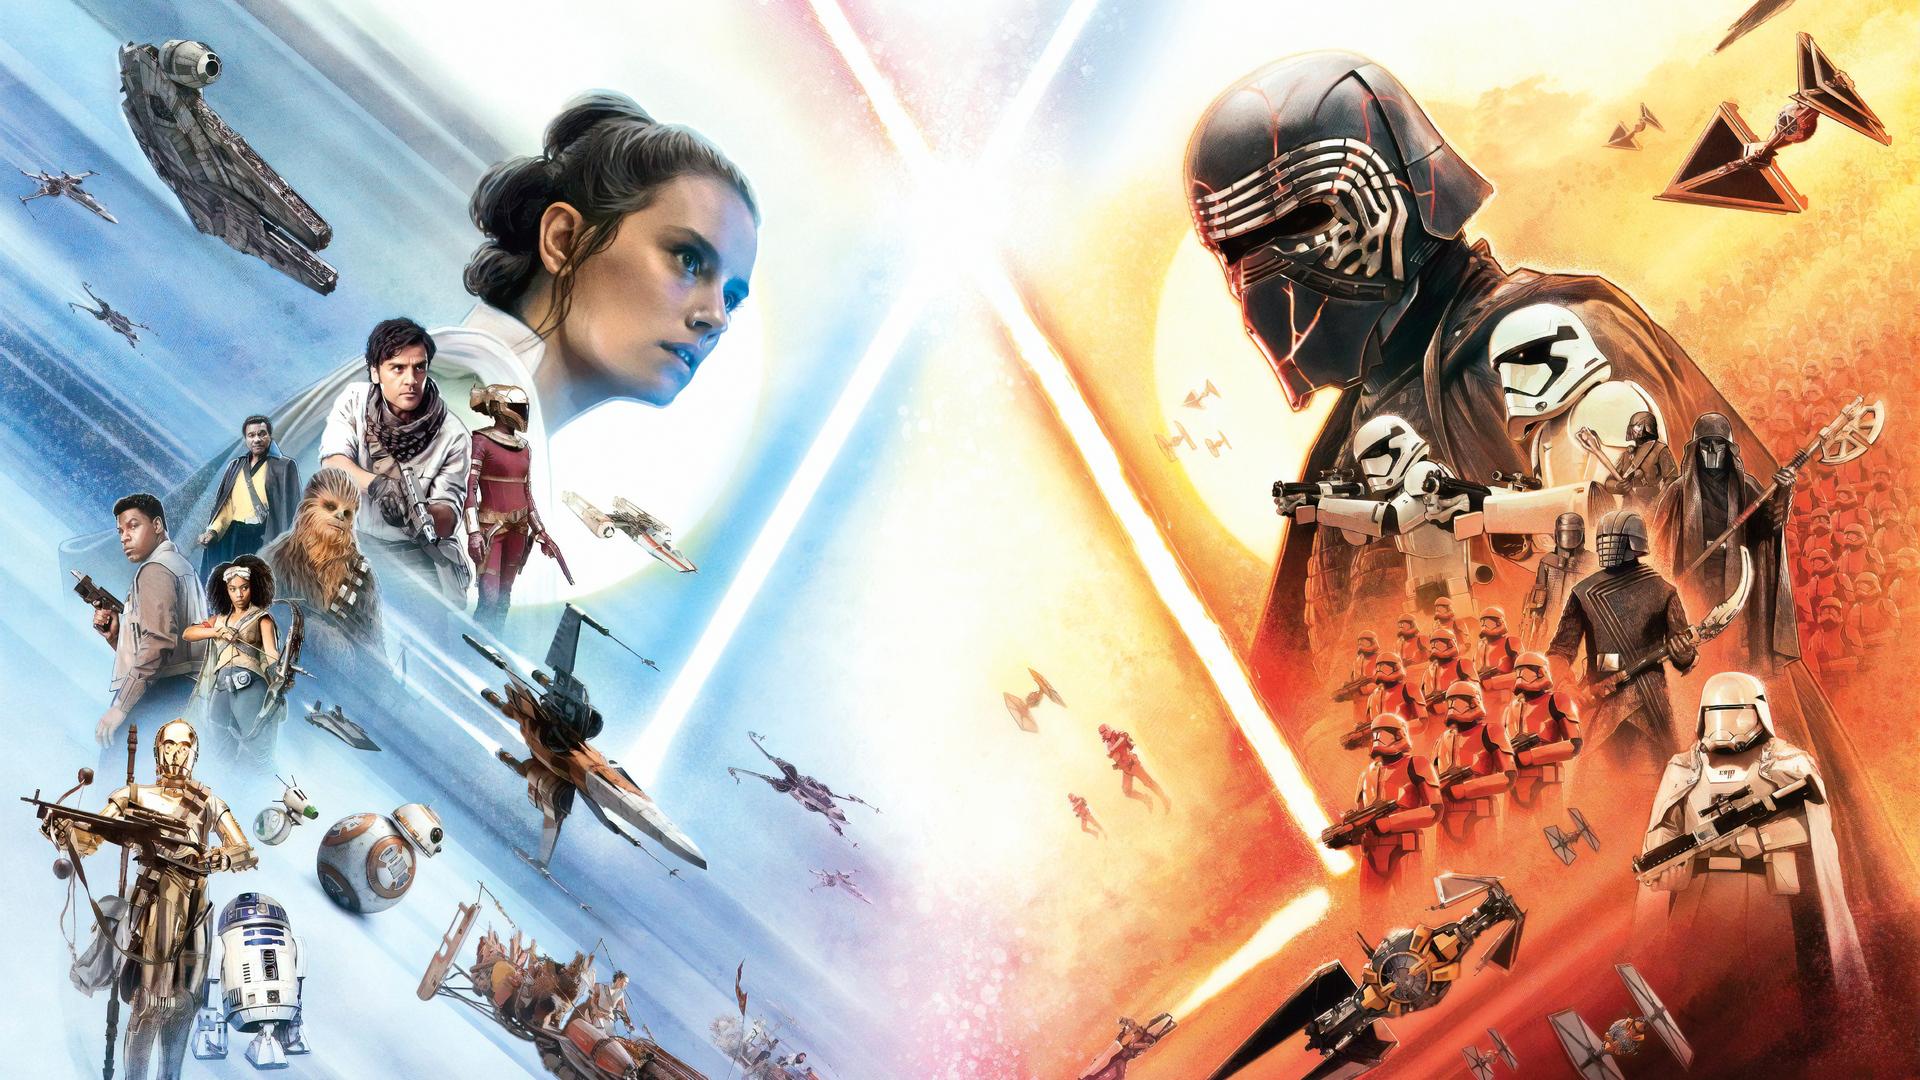 1920x1080 Star Wars The Rise Of Skywalker 4k 2019 Laptop ...